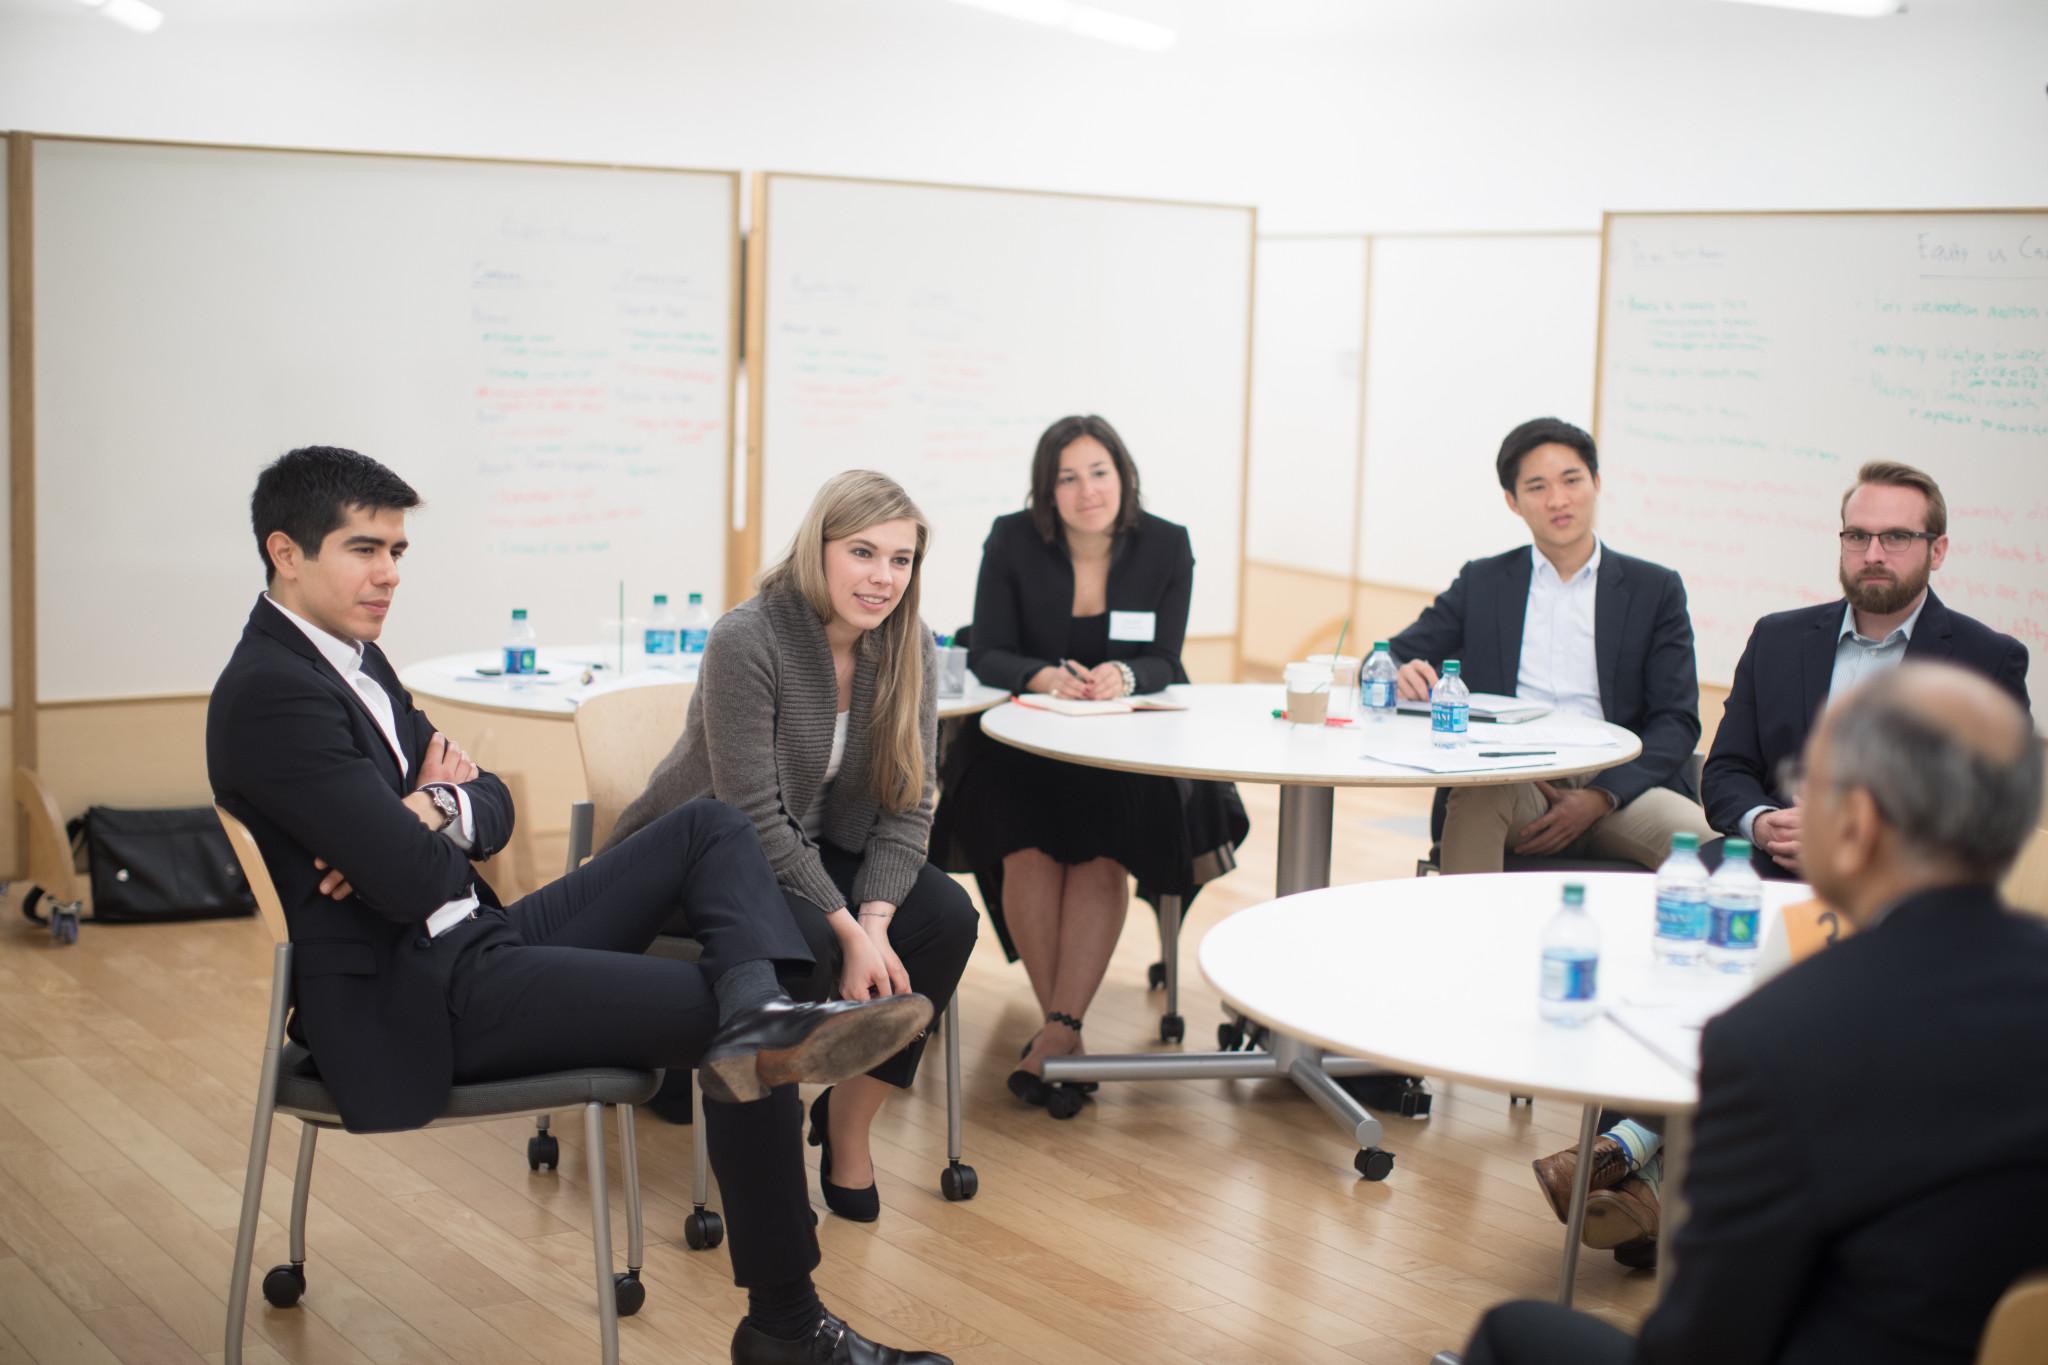 Taking Care to Prepare Leaders: Lessons in Leadership Development from DaVita Kidney Care